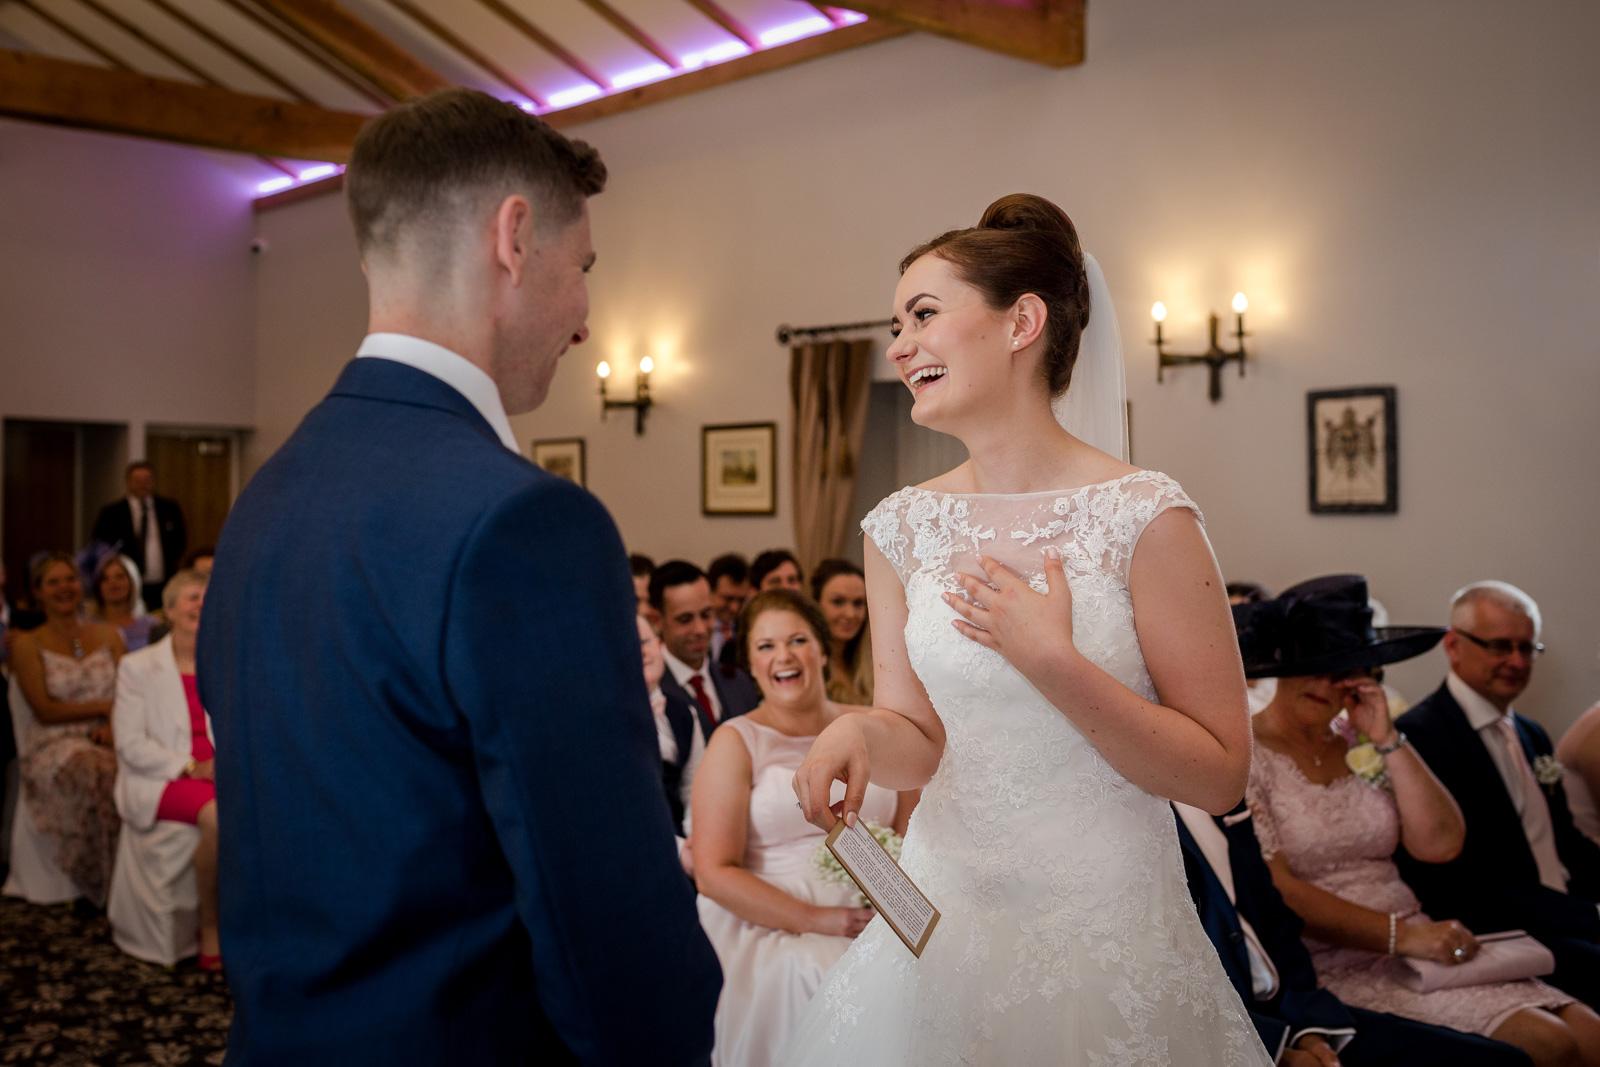 Gary and Bryony's wedding at the villa wrea green